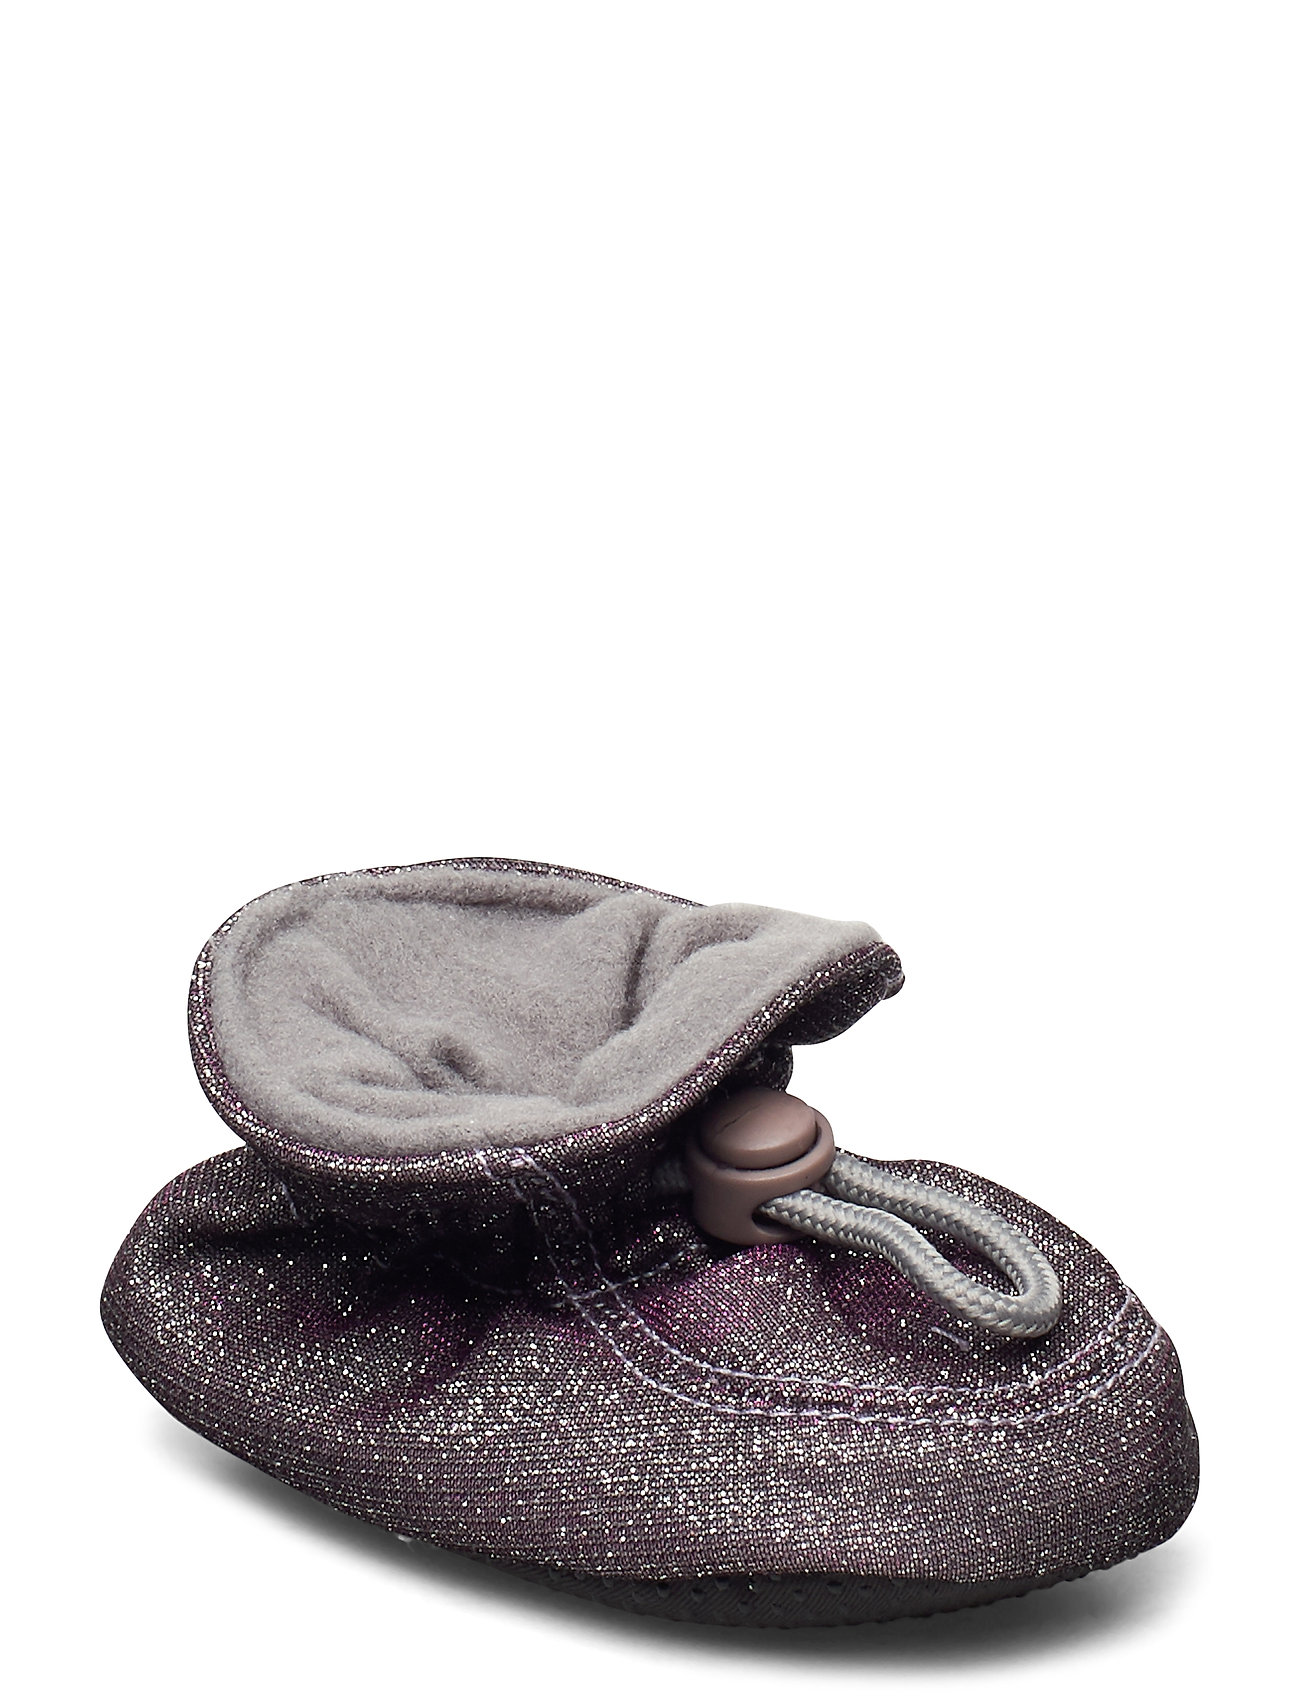 Image of Tight Socks & Tights Tights Lyserød Melton (3445310733)